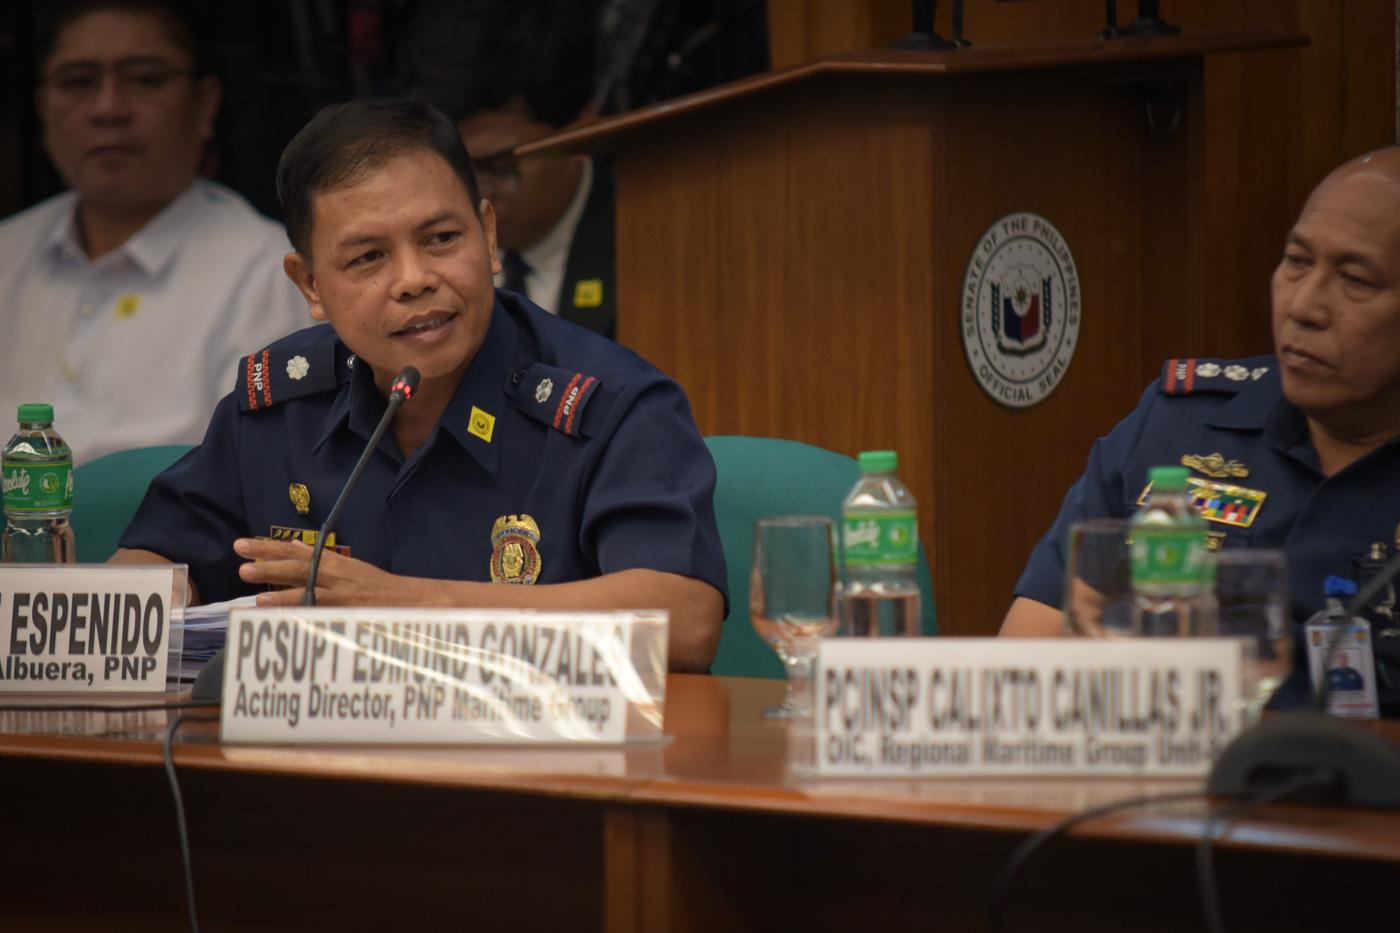 MAN OF GOD. Police Chief Inspector Jovie Espenido testifies in the Senate. Photo by LeAnne Jazul/Rappler